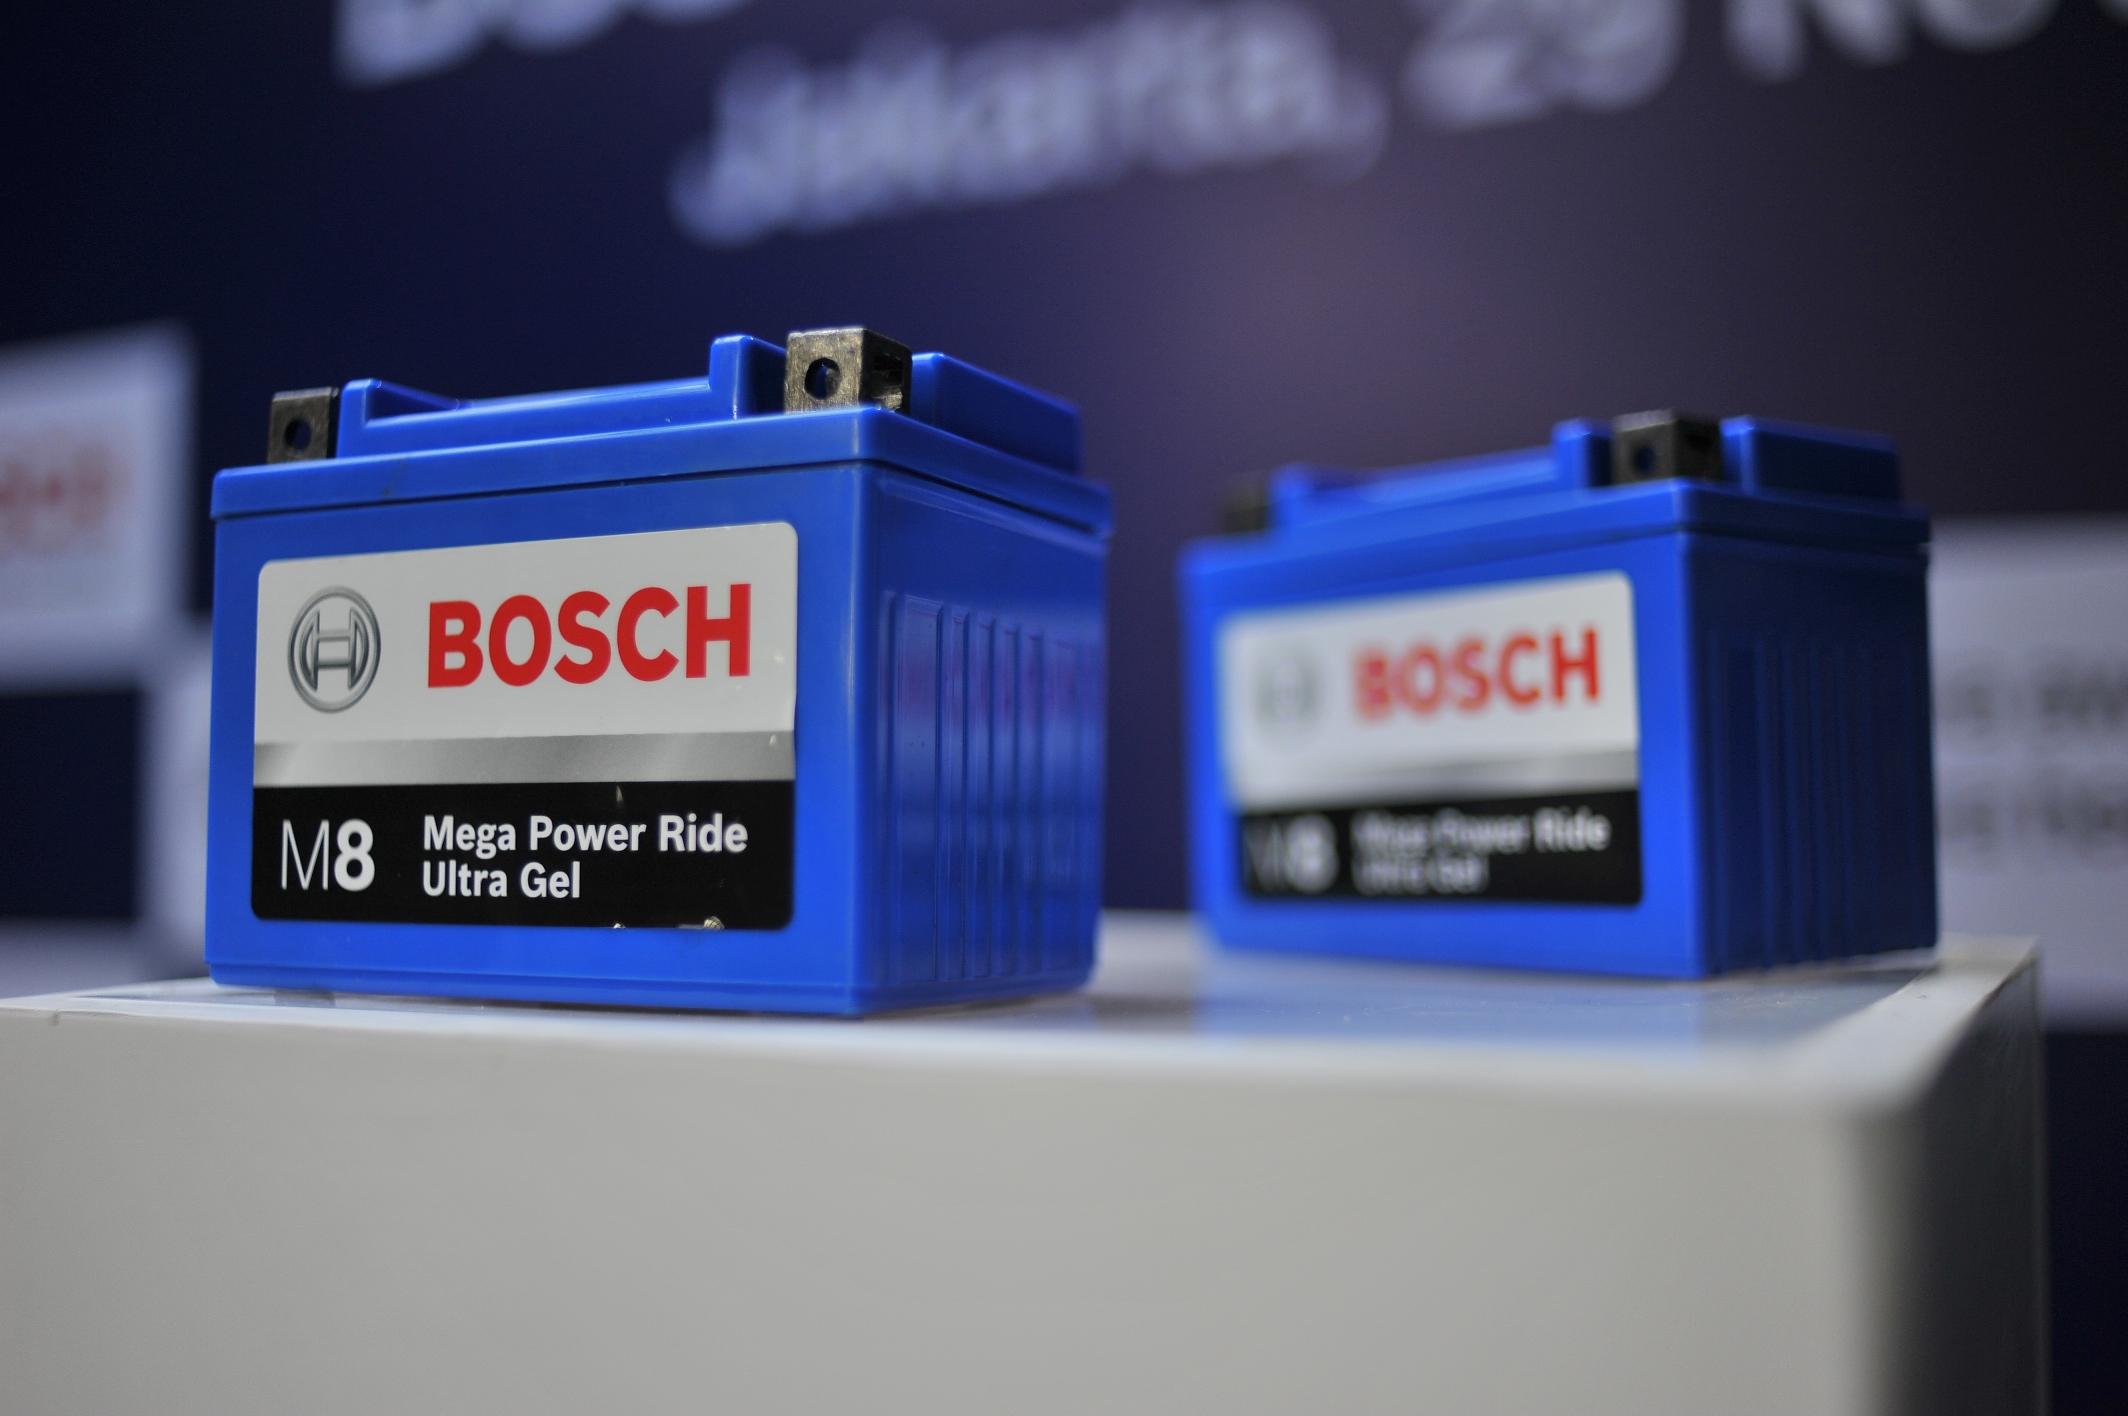 Bosch Ramaikan Pasar Aki di Indonesia